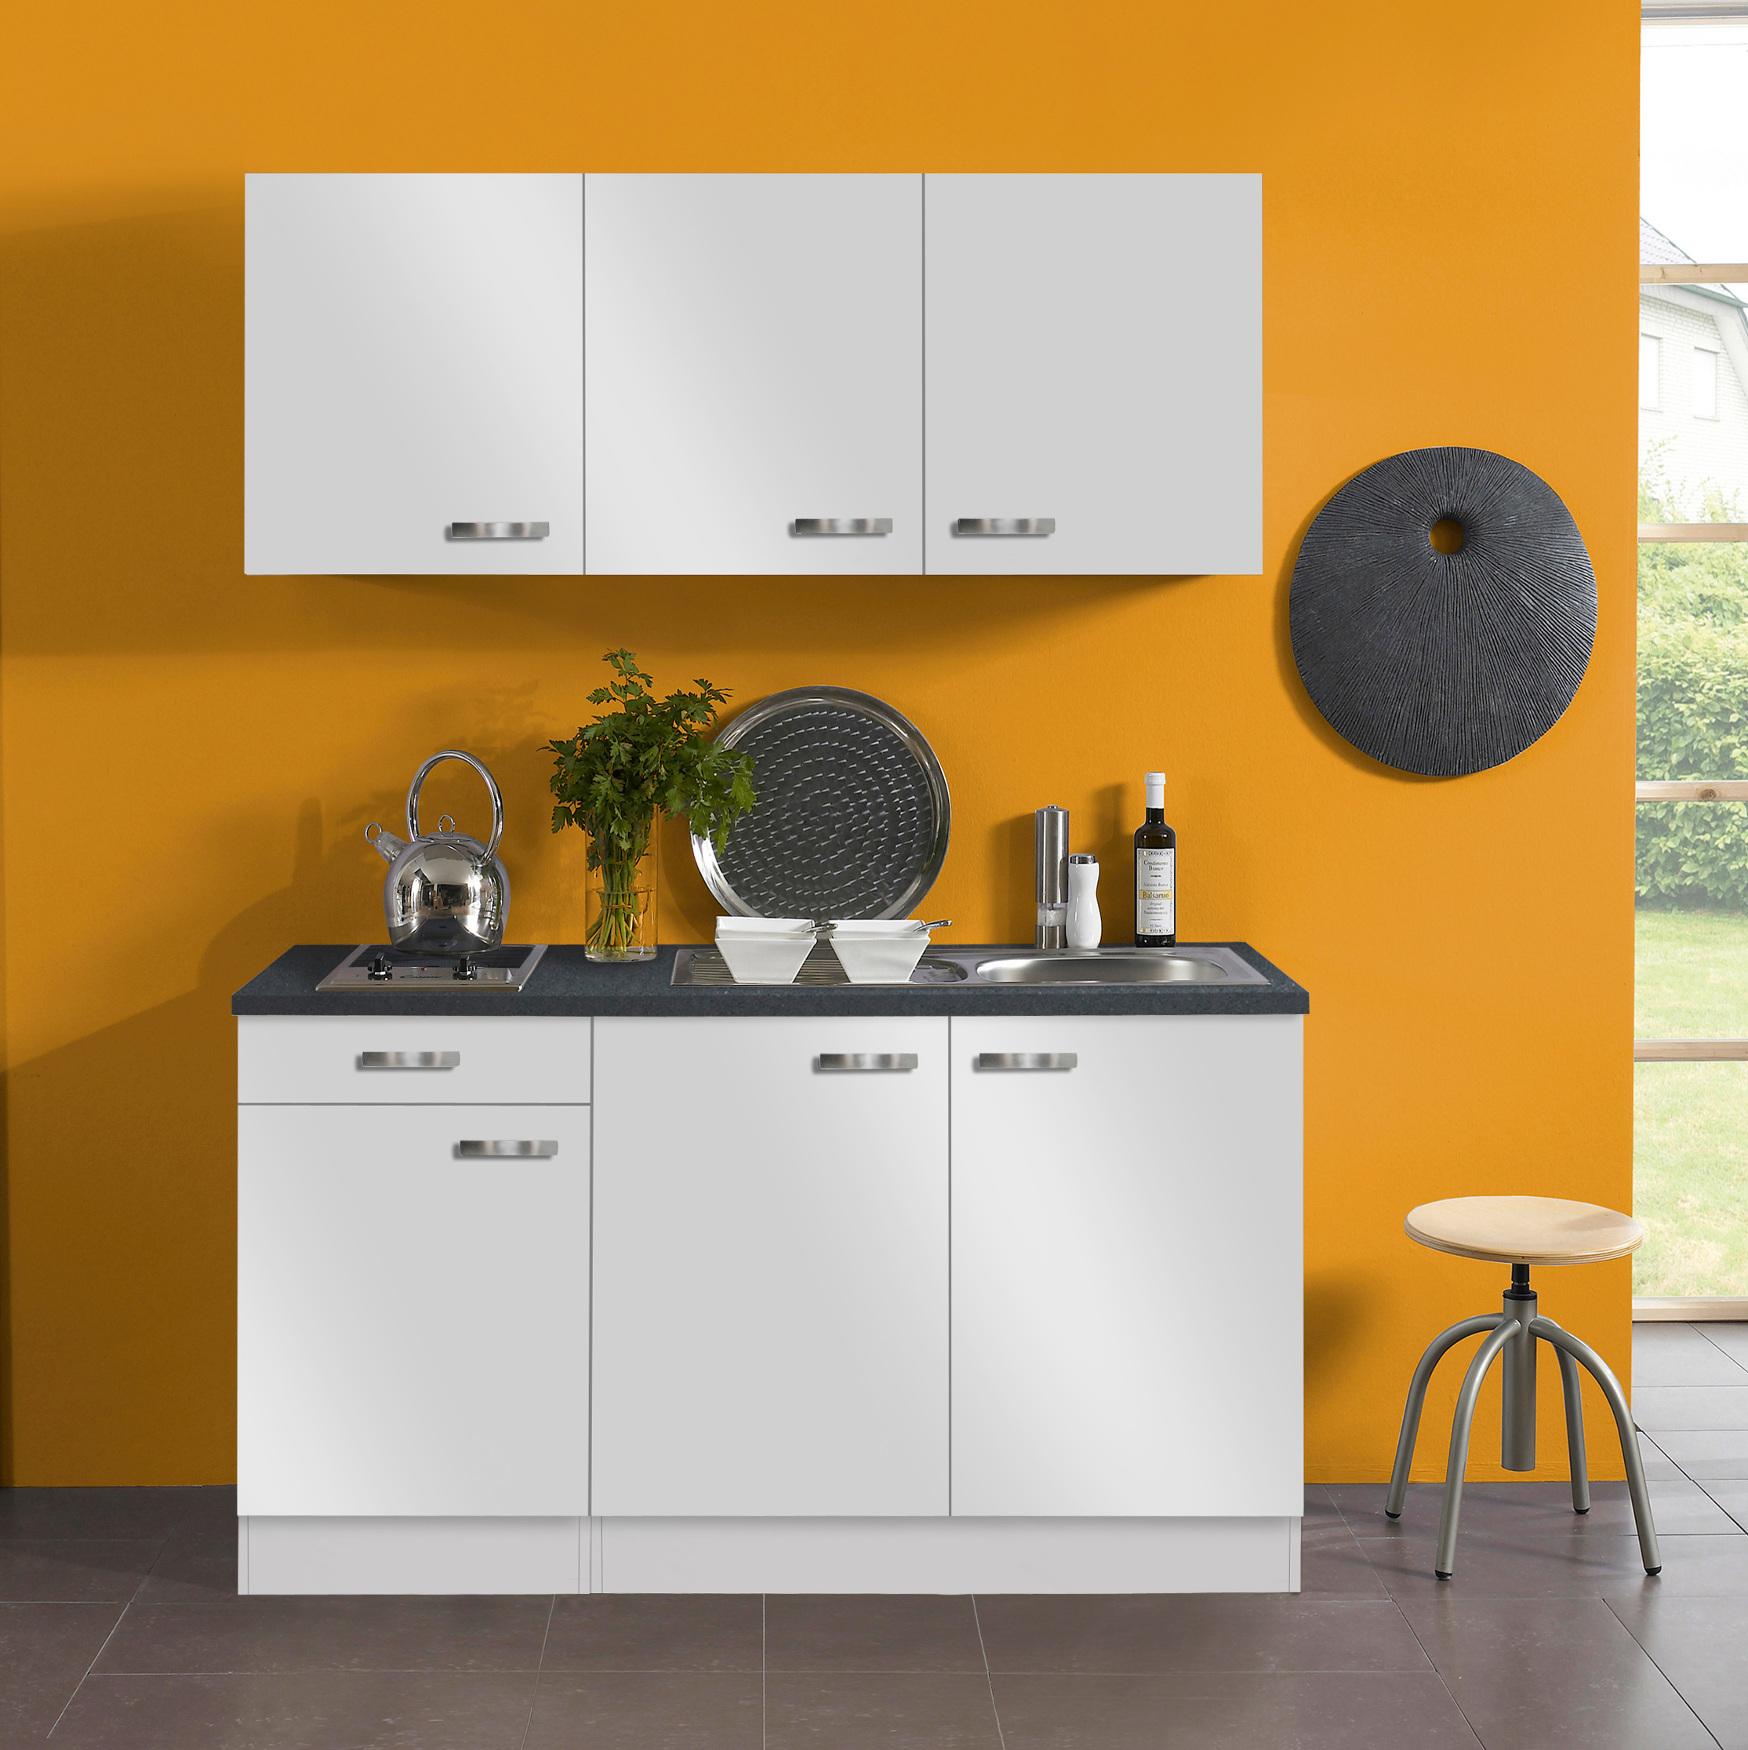 singlek che granada mit glaskeramik kochfeld 7 teilig breite 150 cm wei k che singlek chen. Black Bedroom Furniture Sets. Home Design Ideas